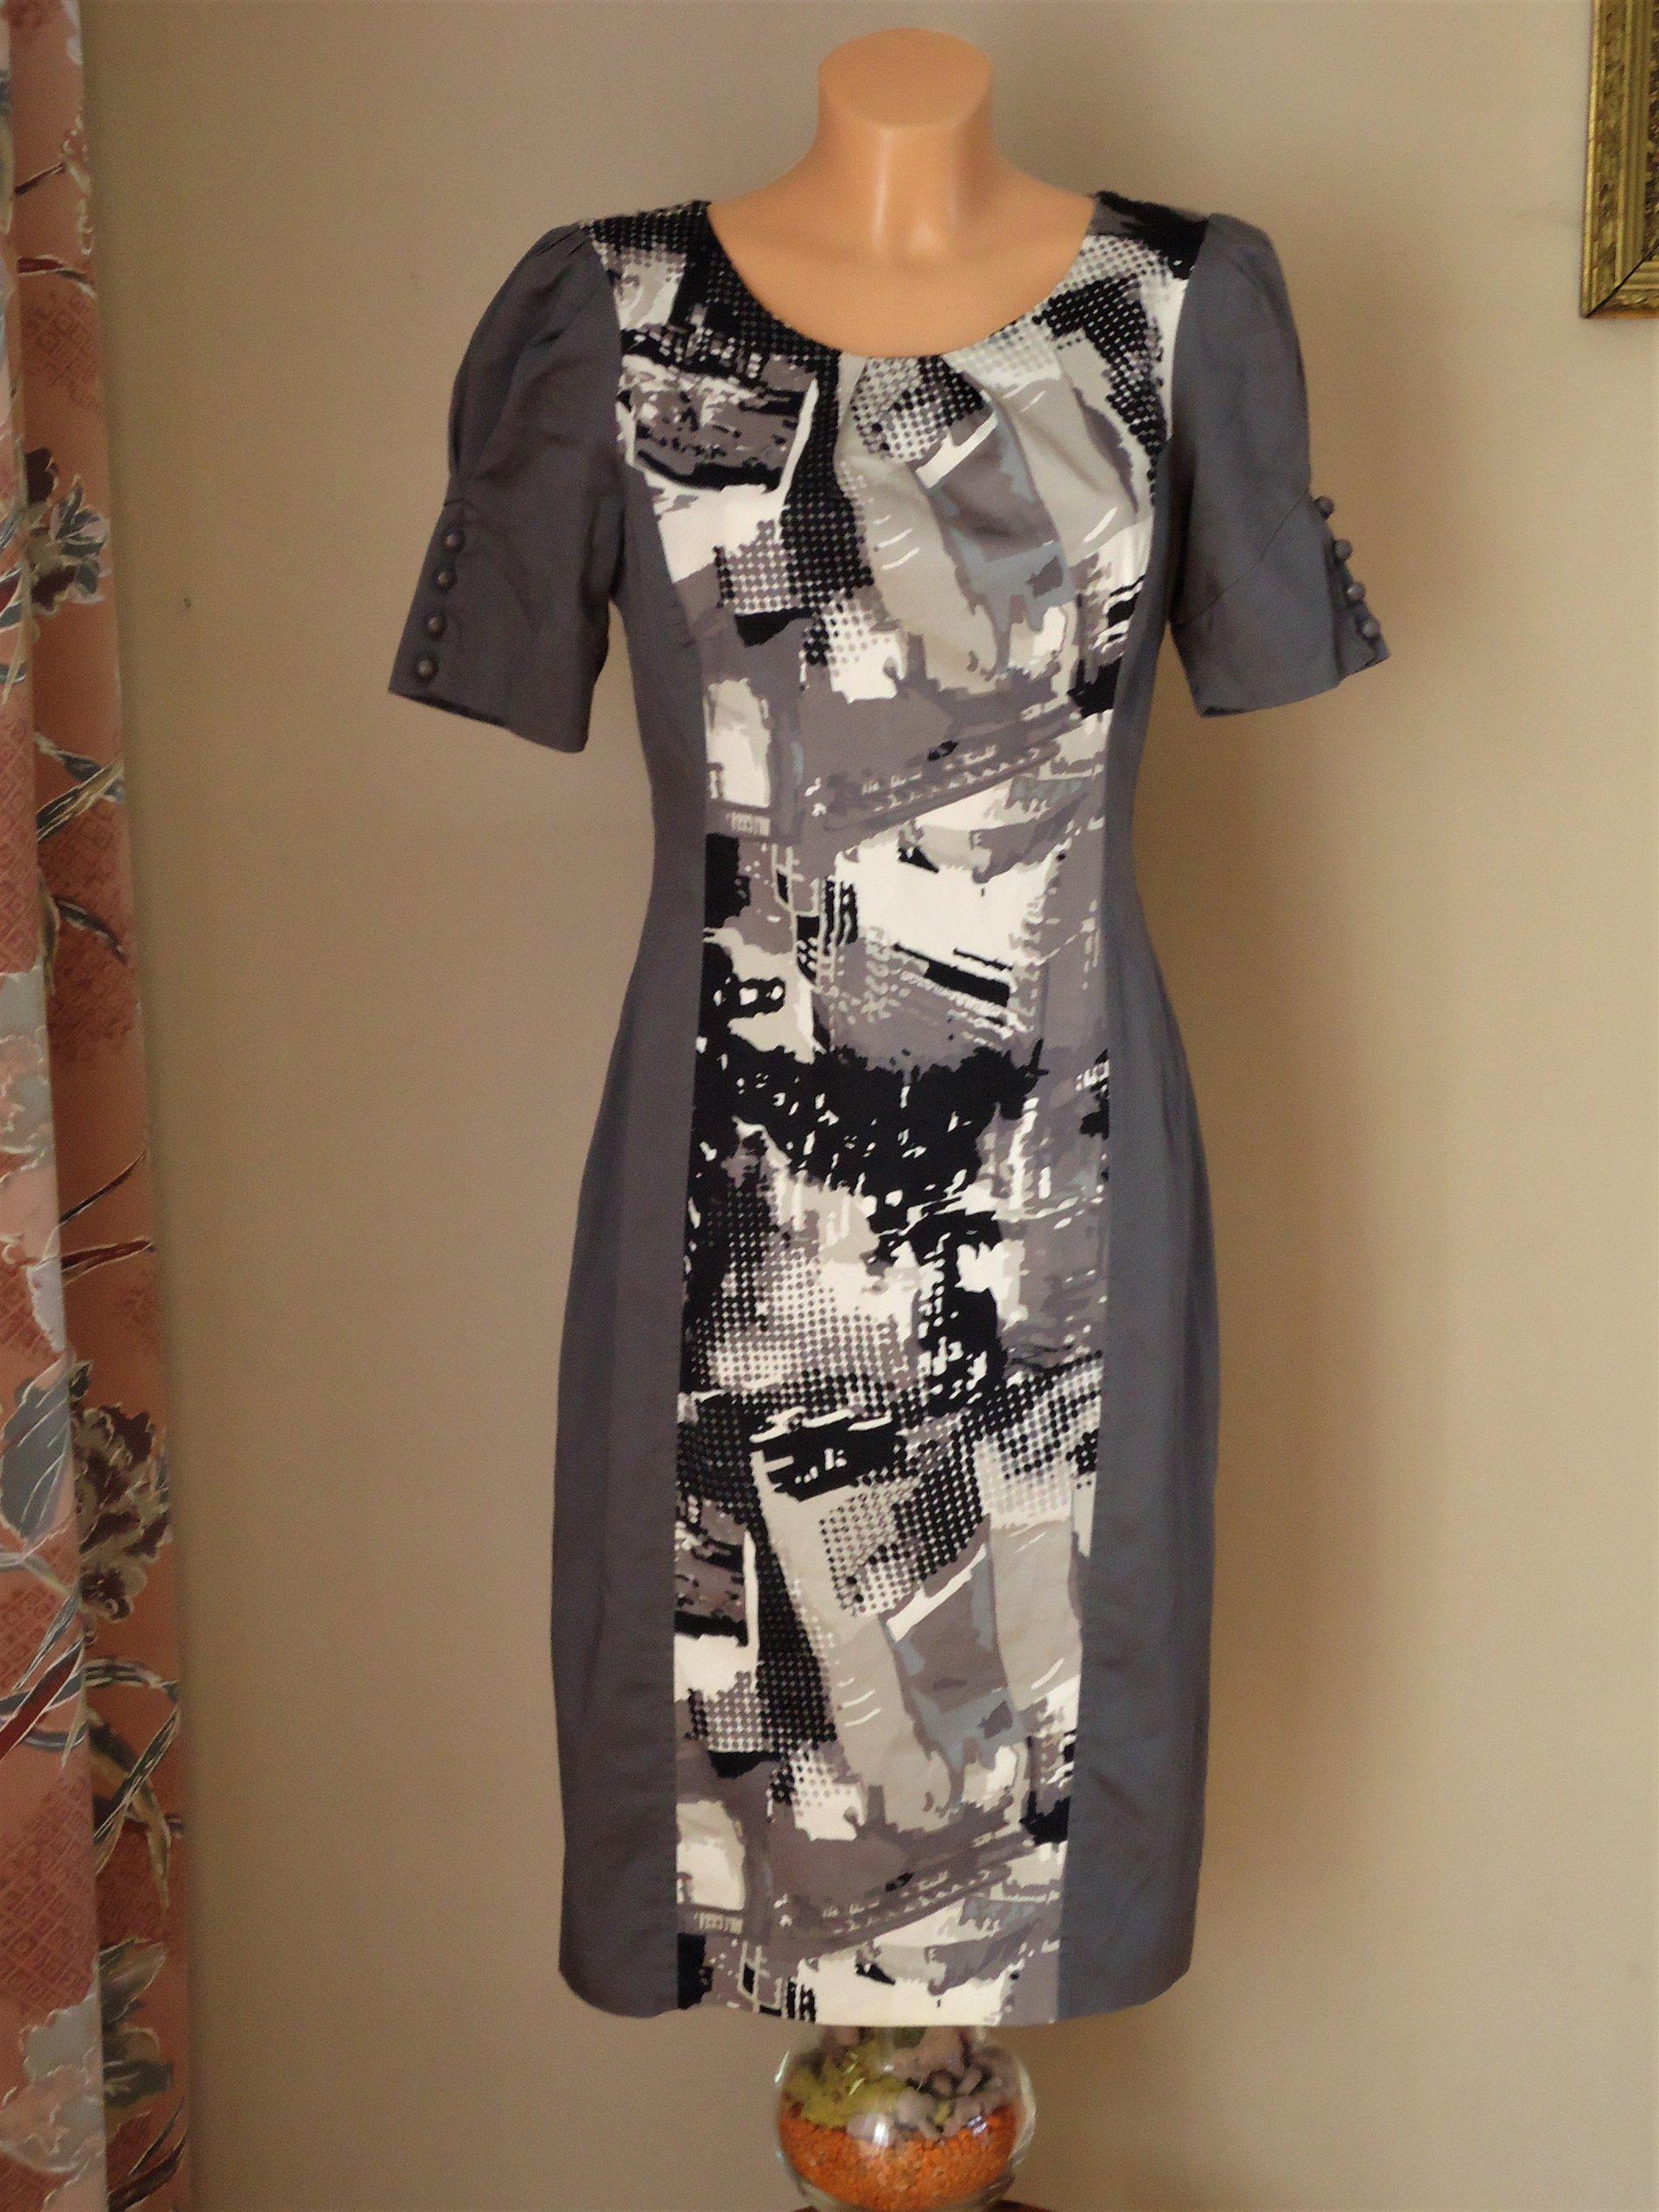 68318d10c1 Sukienka r 38 firmy De Facto - 7344255900 - oficjalne archiwum allegro